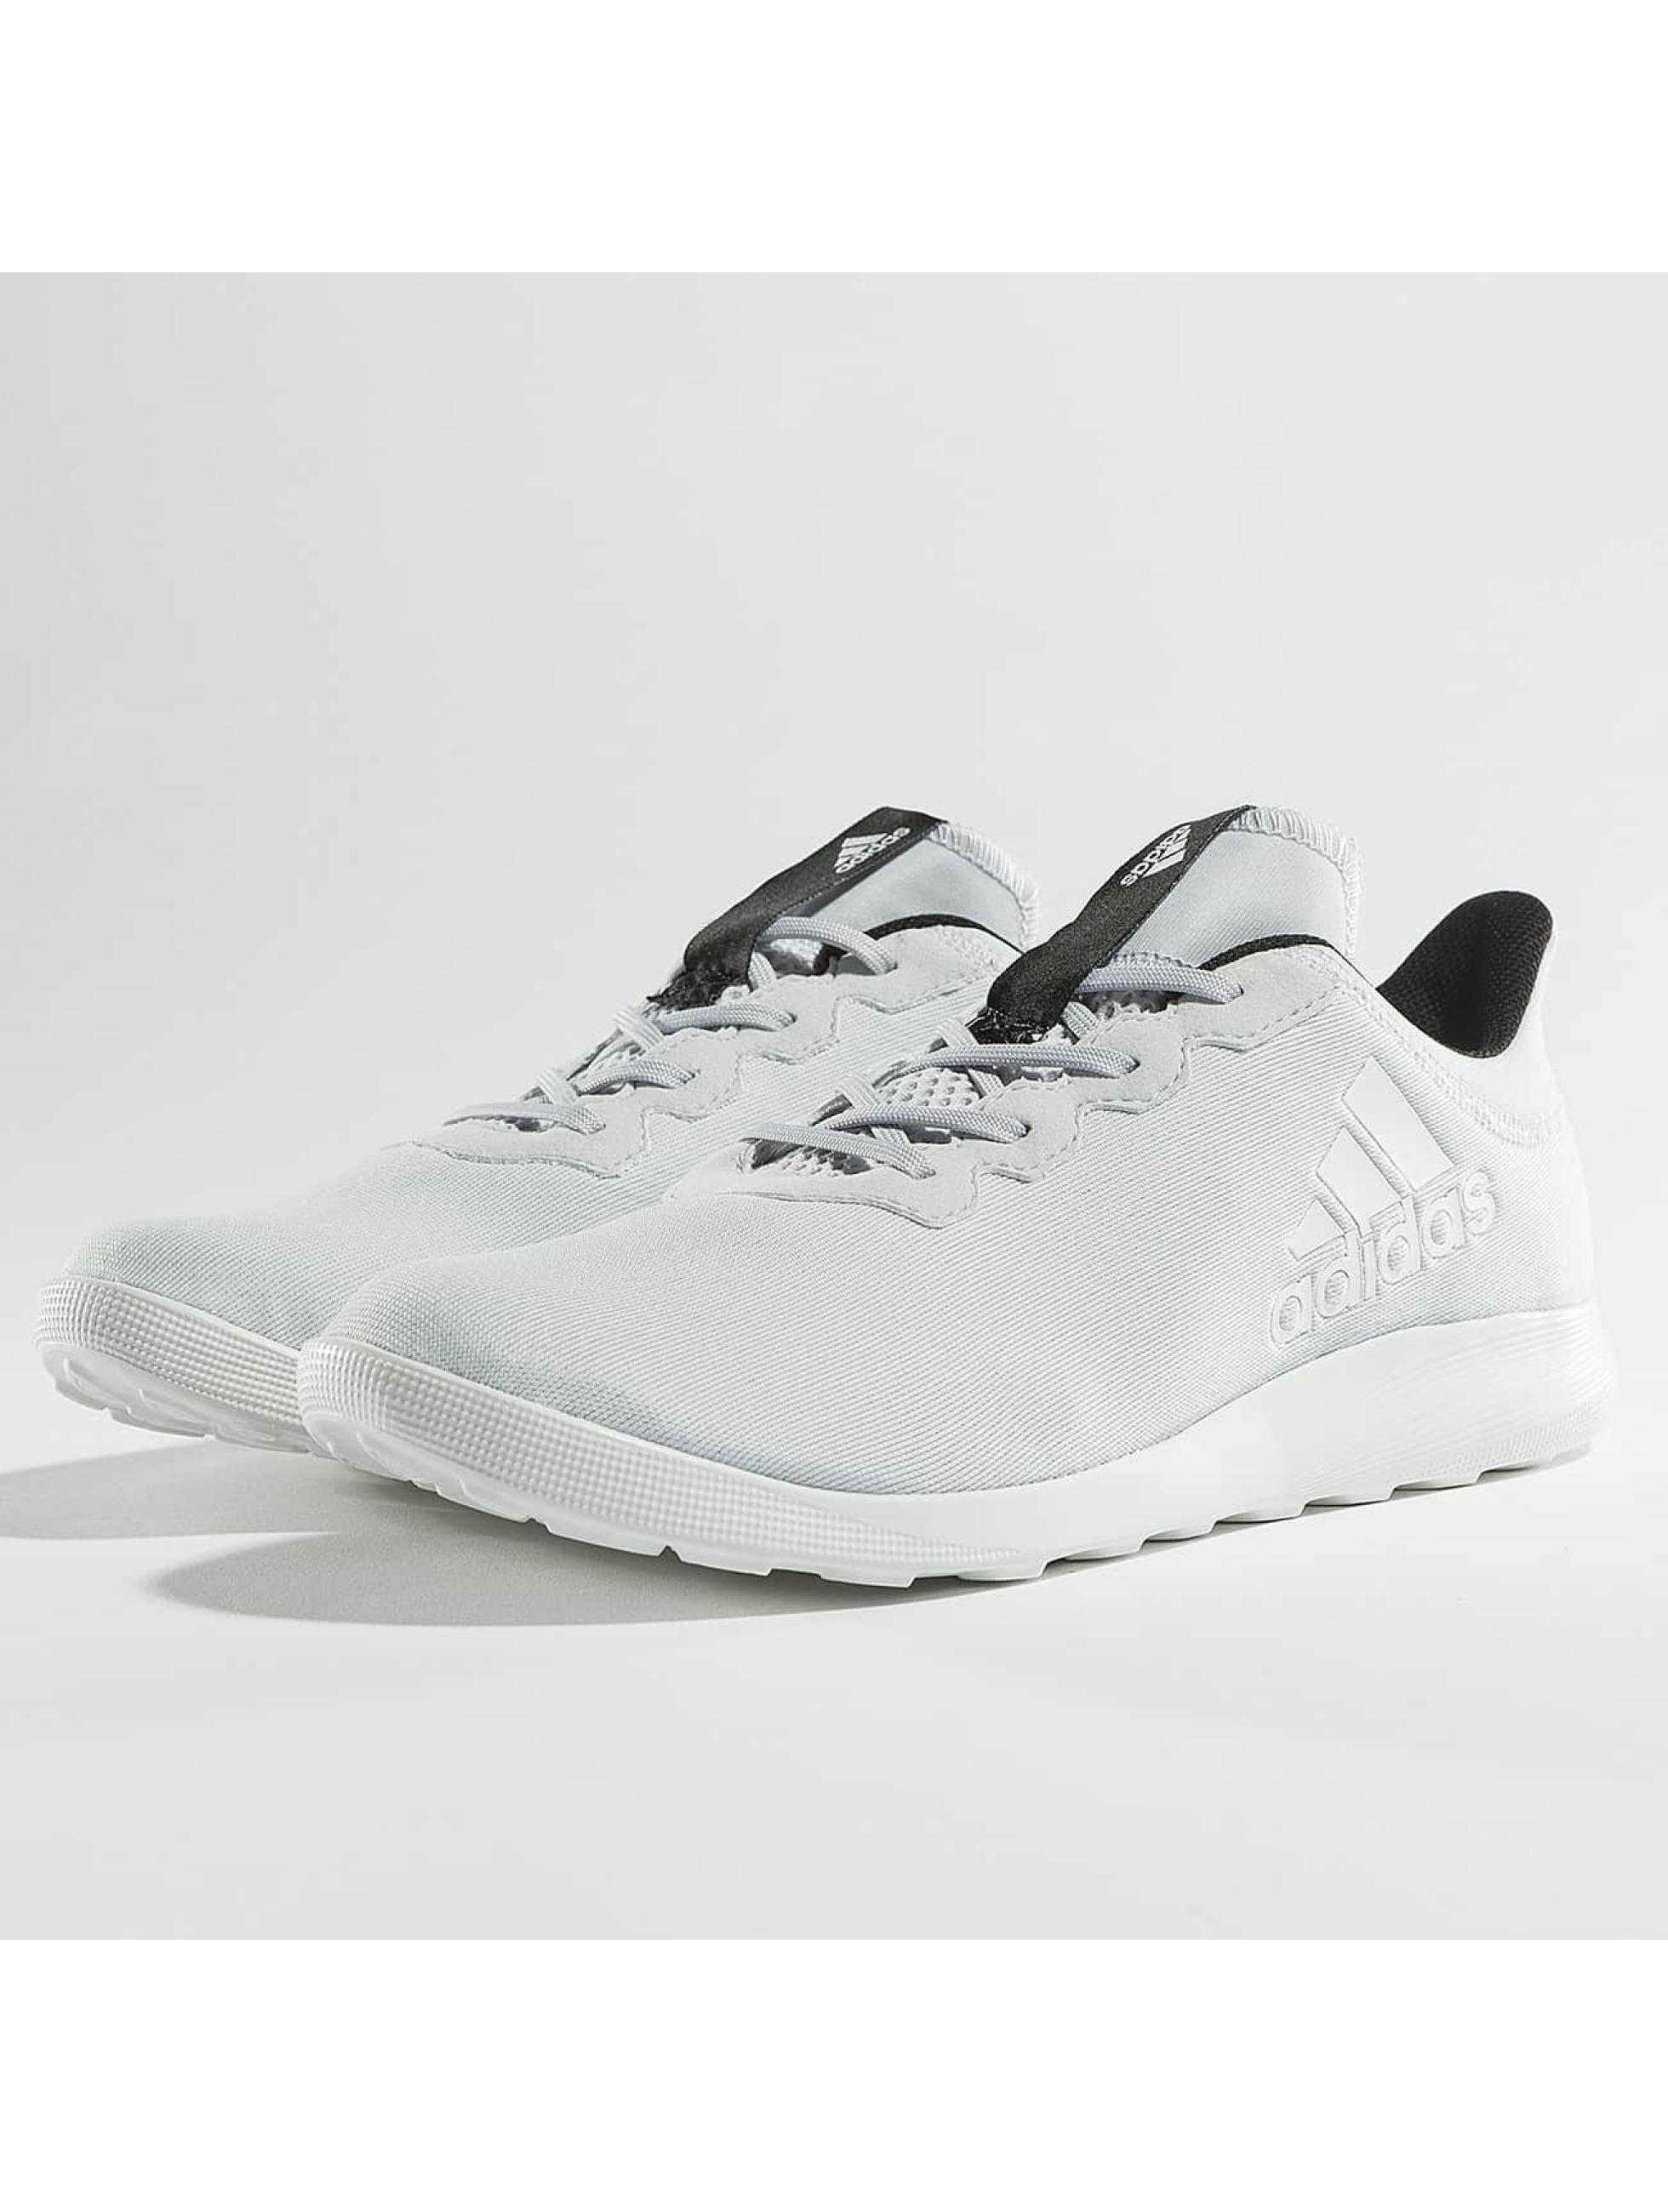 adidas Performance Männer Sneaker X 16.4 TR in grau